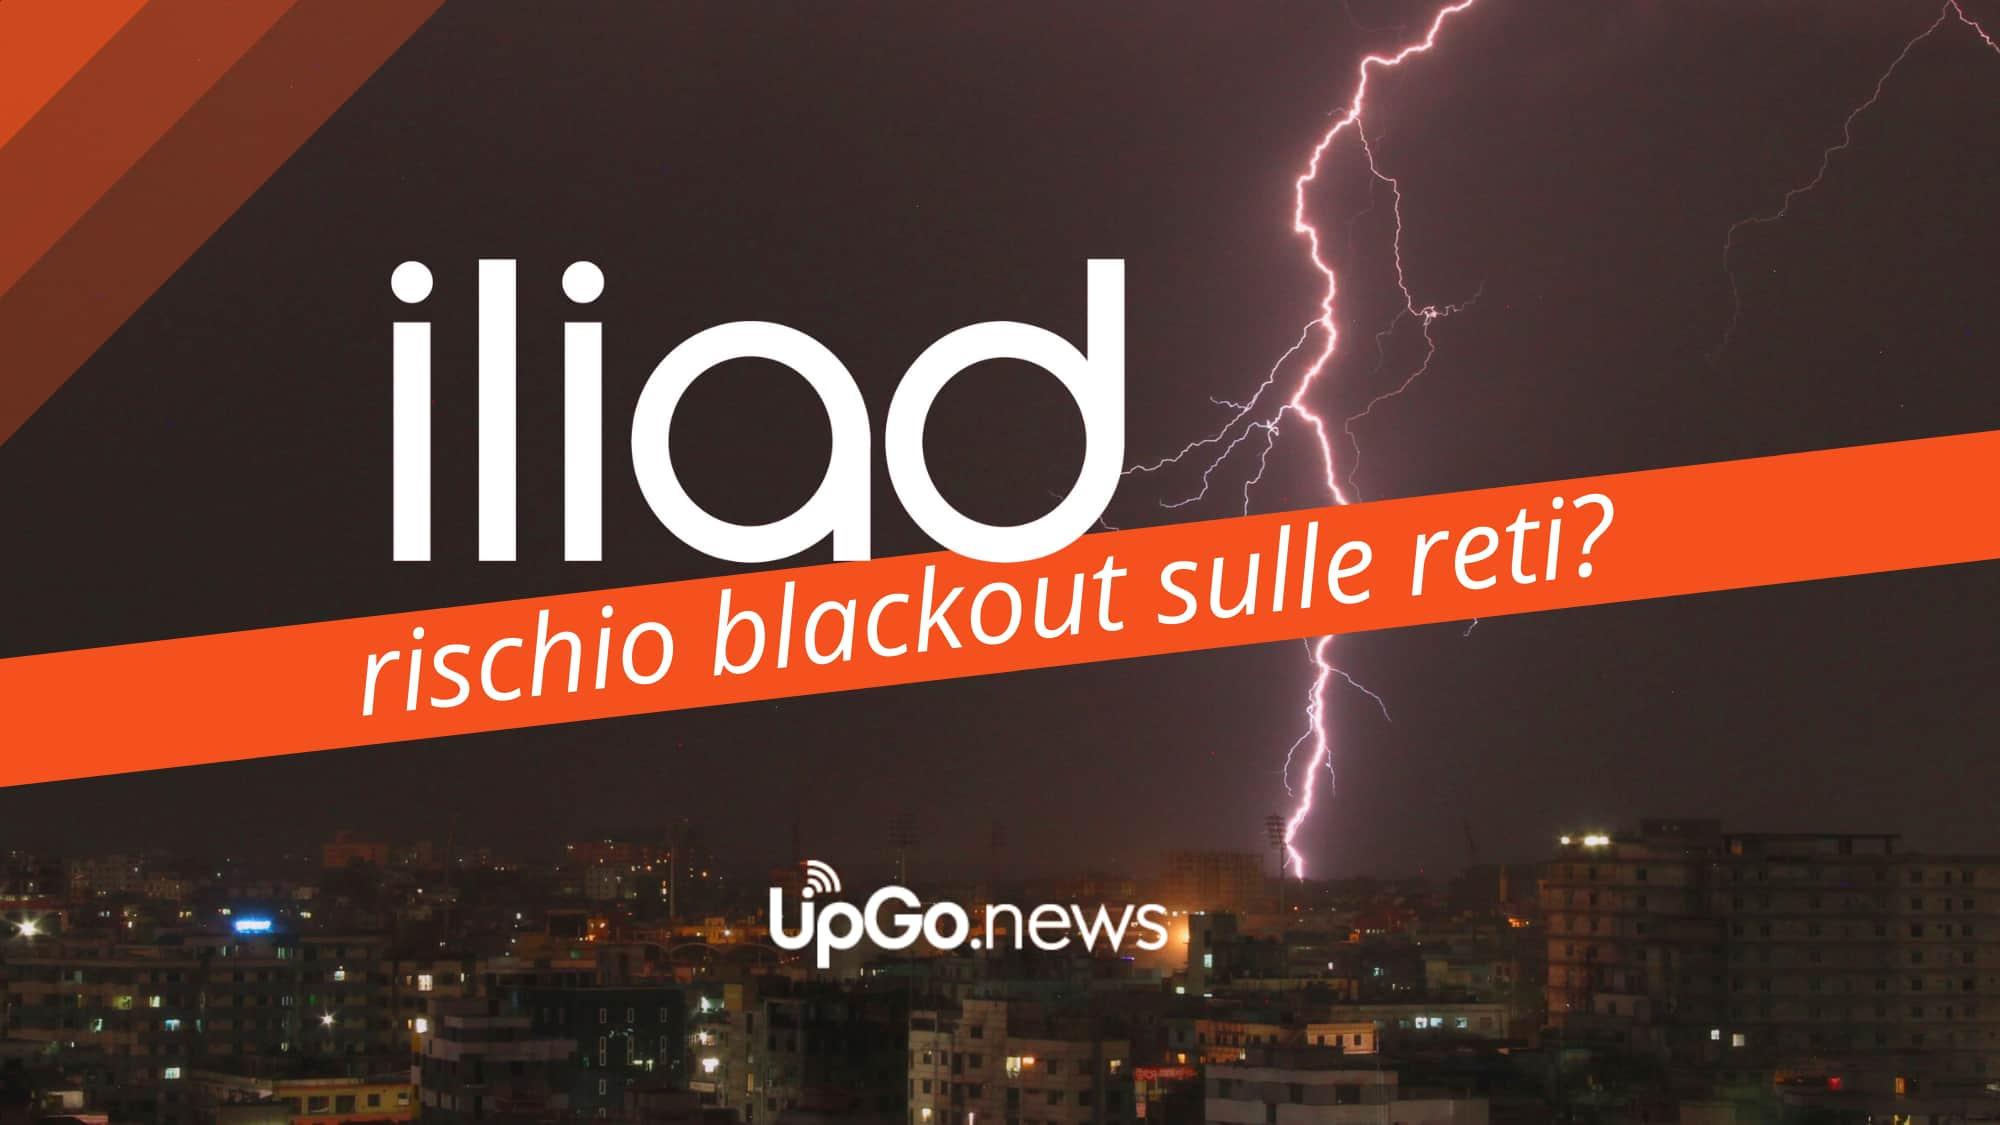 Iliad rischio blackout